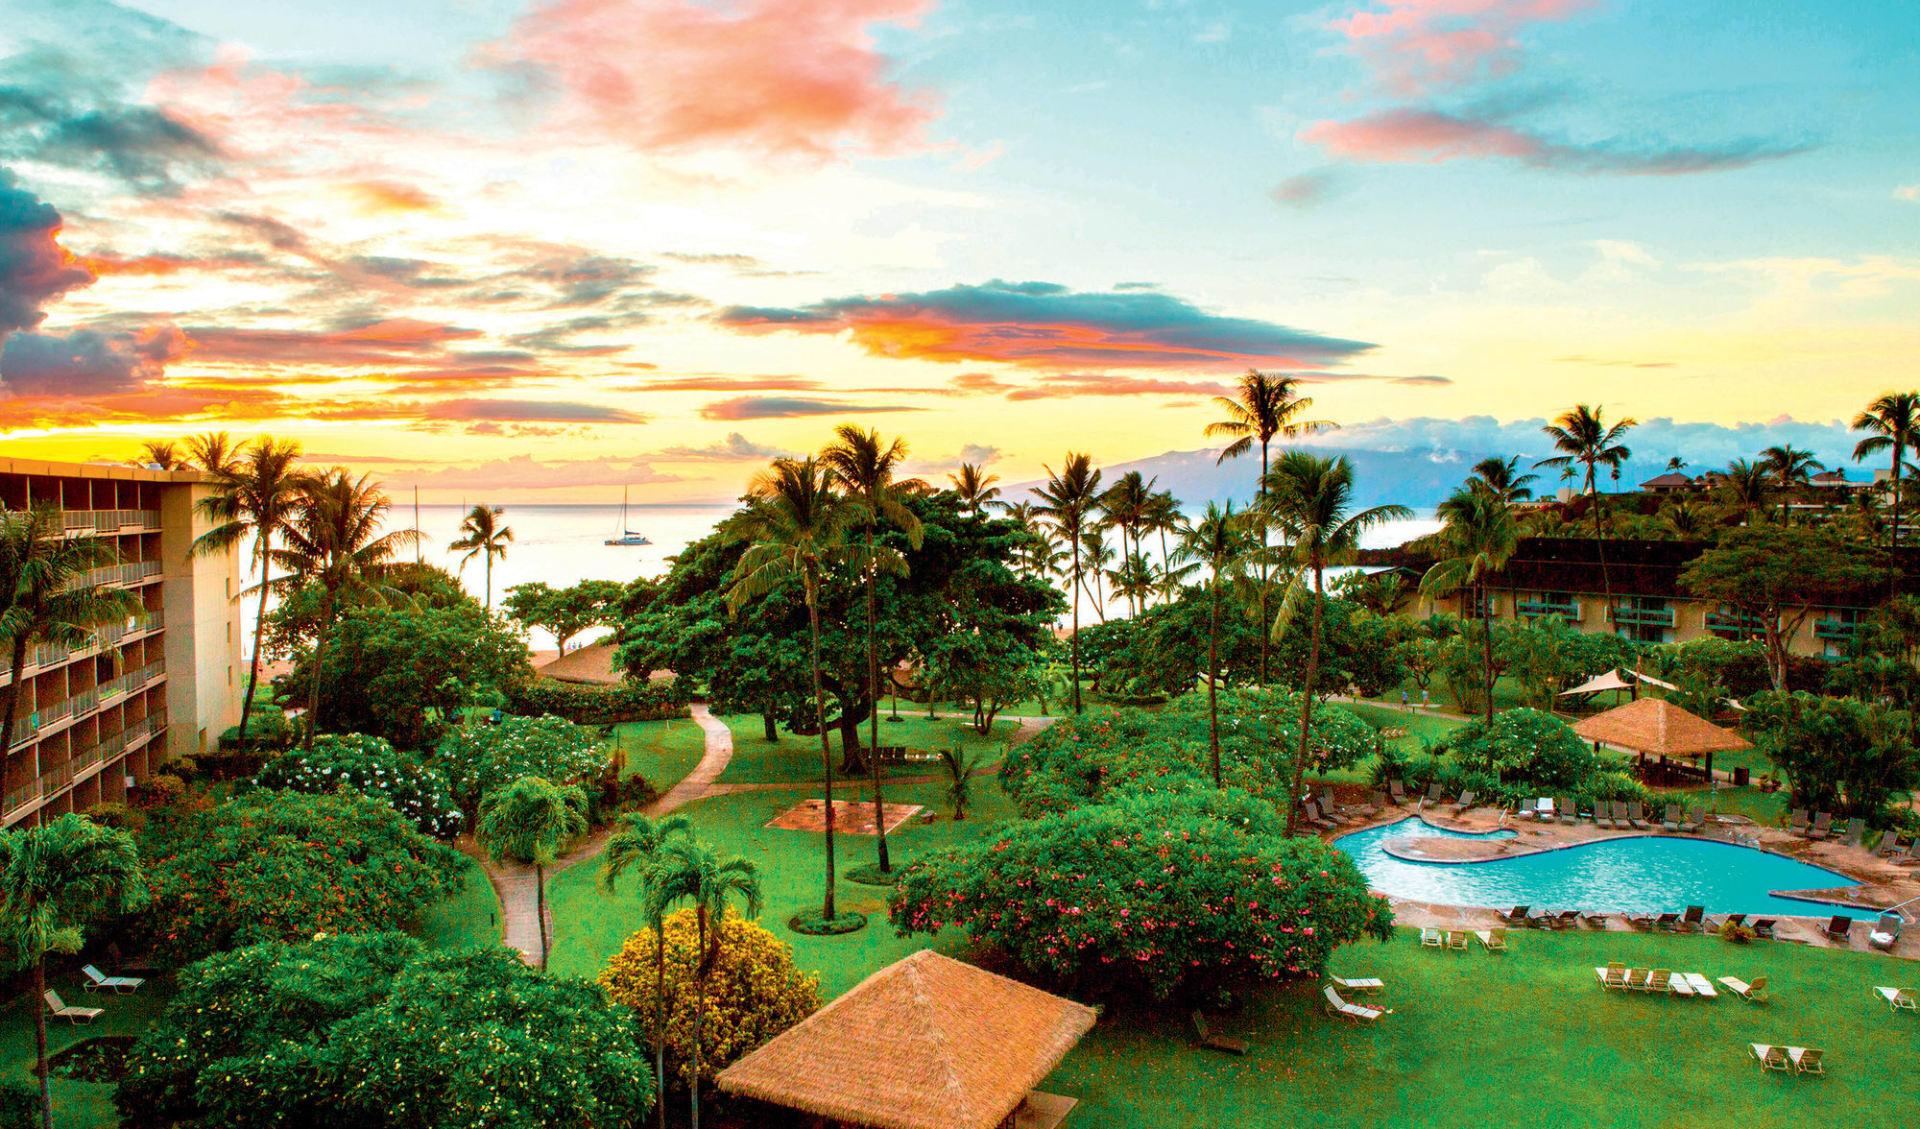 Kaanapali Beach Hotel in Lahaina - Maui: natur kaanapali beach hotel gartenanlage hotel